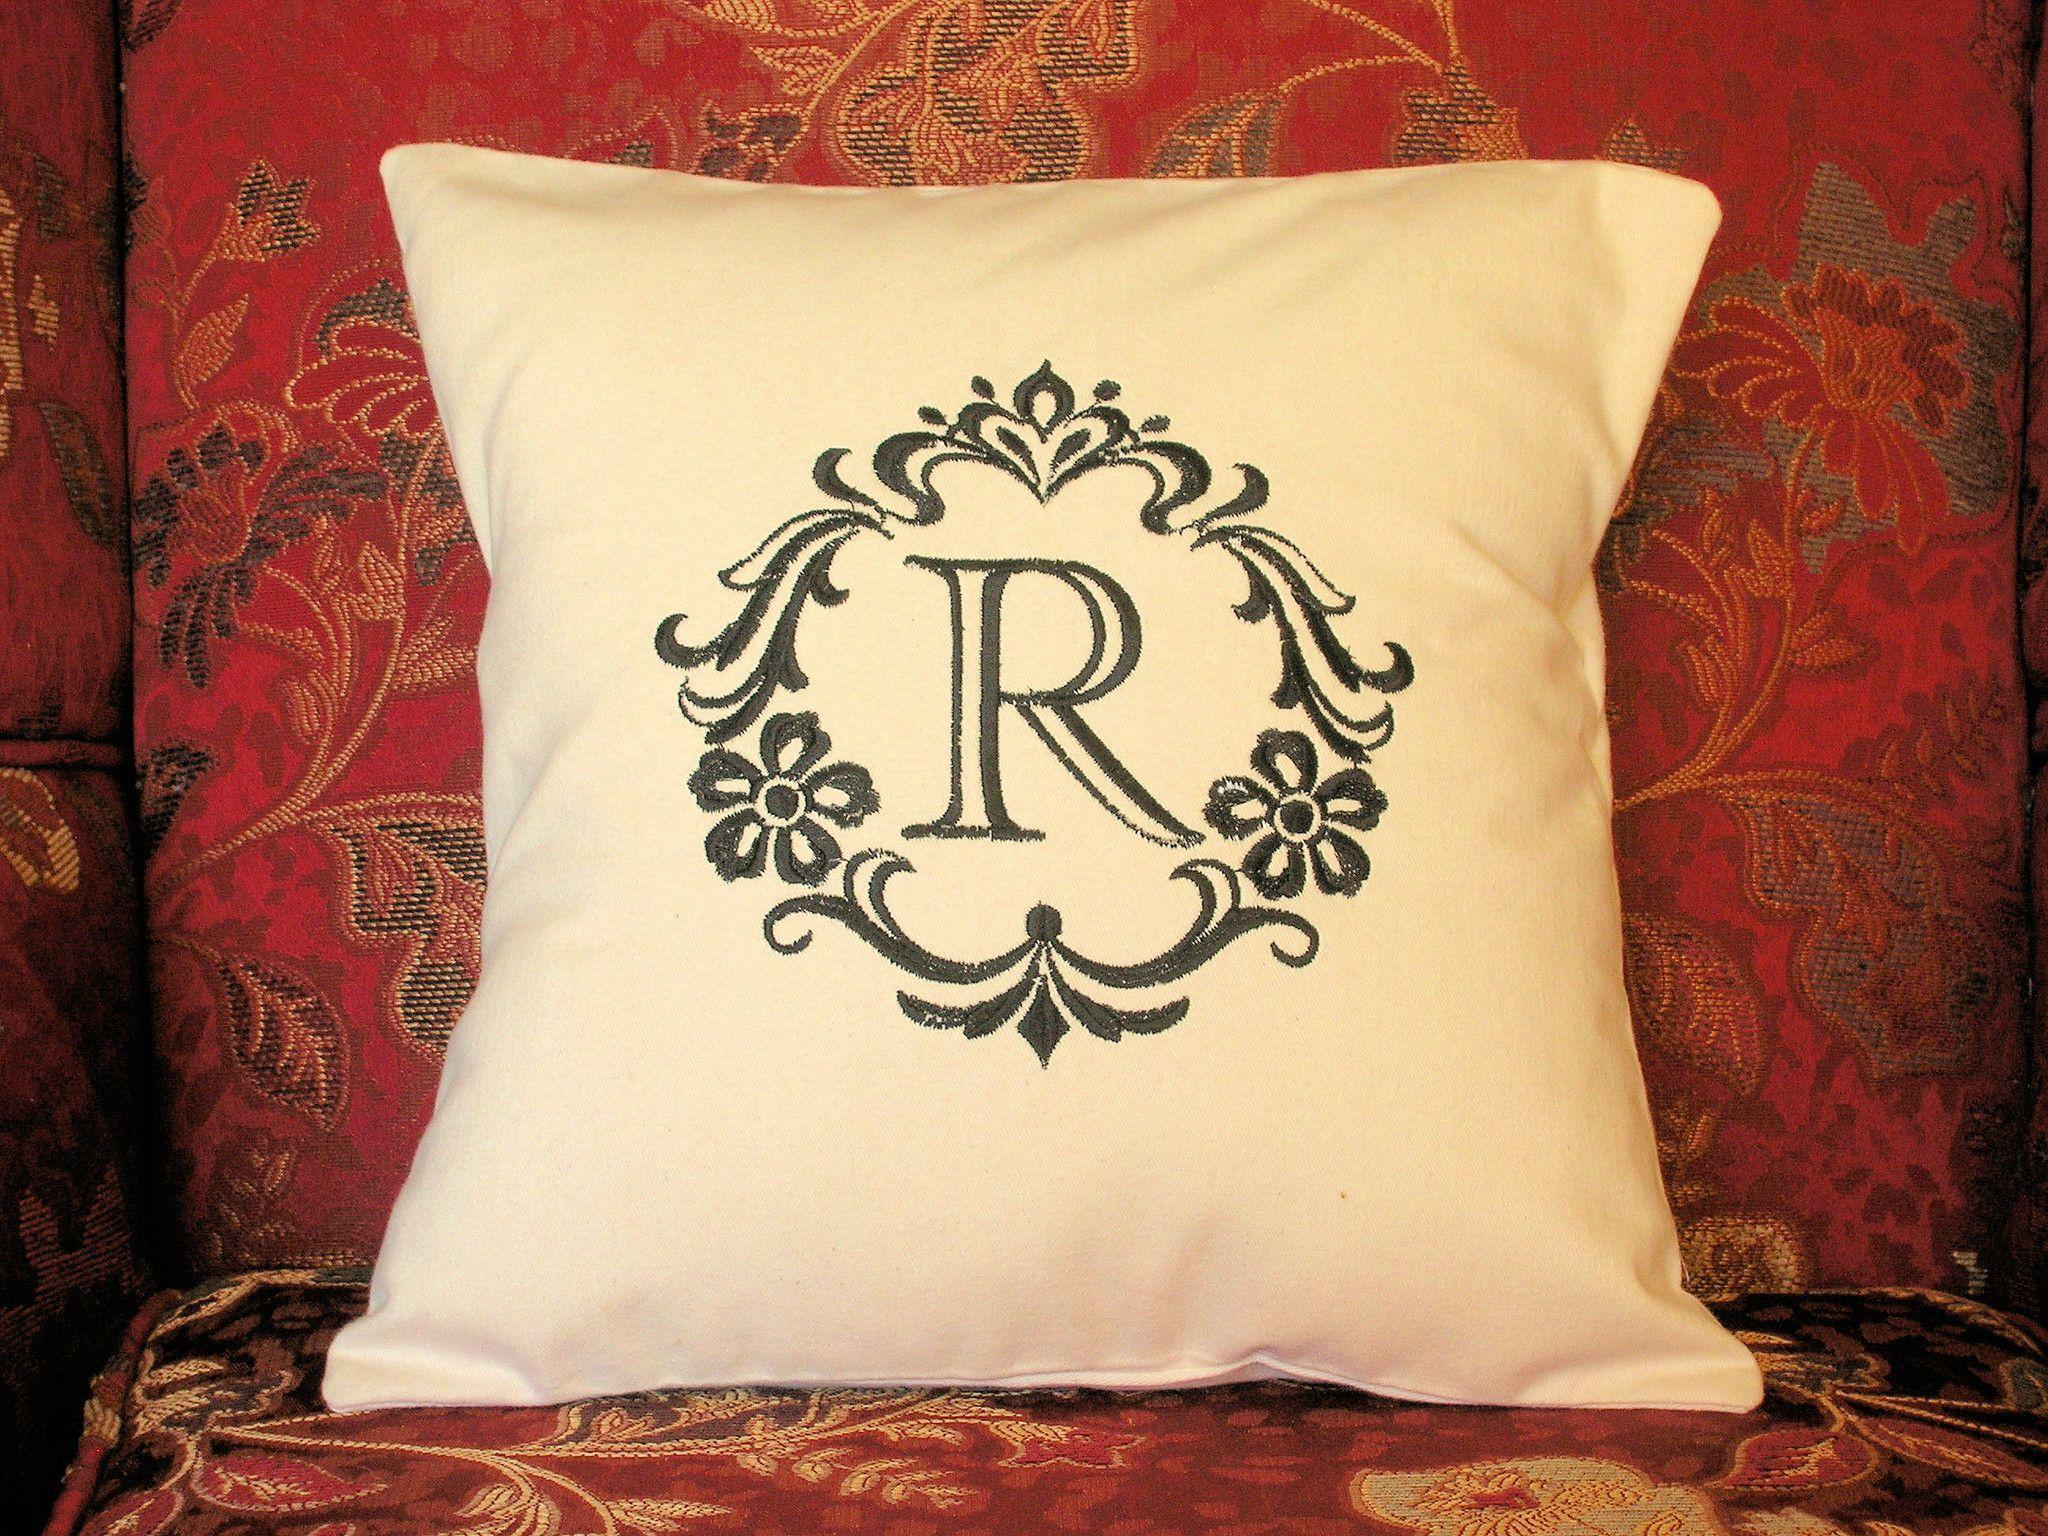 Pillow Cover, Damask, Cotton Pillow Cover, Pillow Cover, Monogram Throw Pillow Cover R